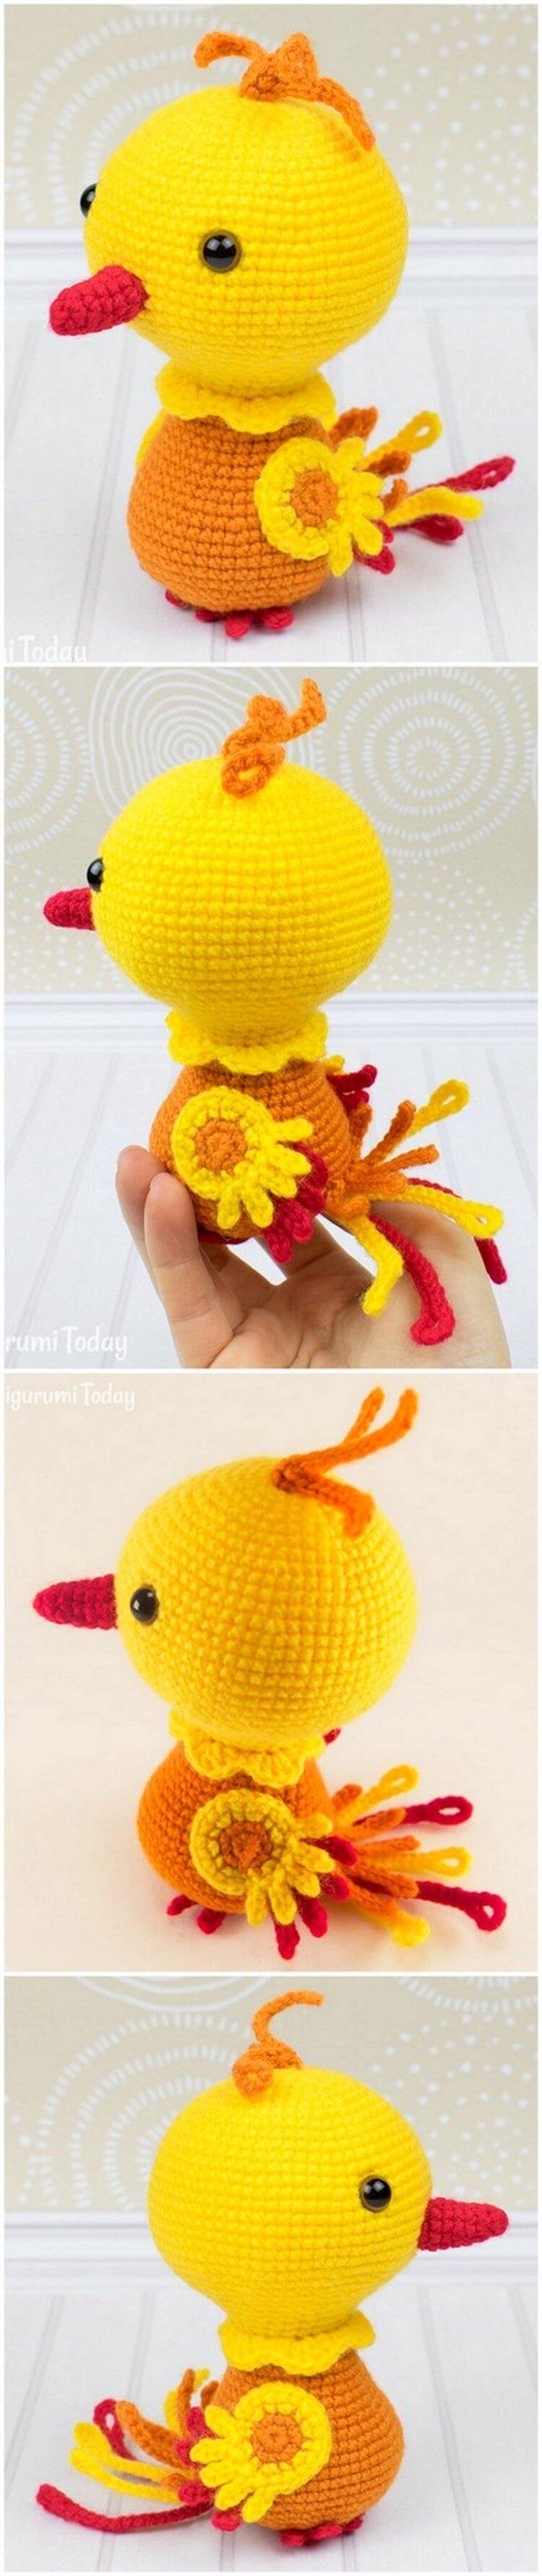 Crochet Amigurumi Pattern (62)